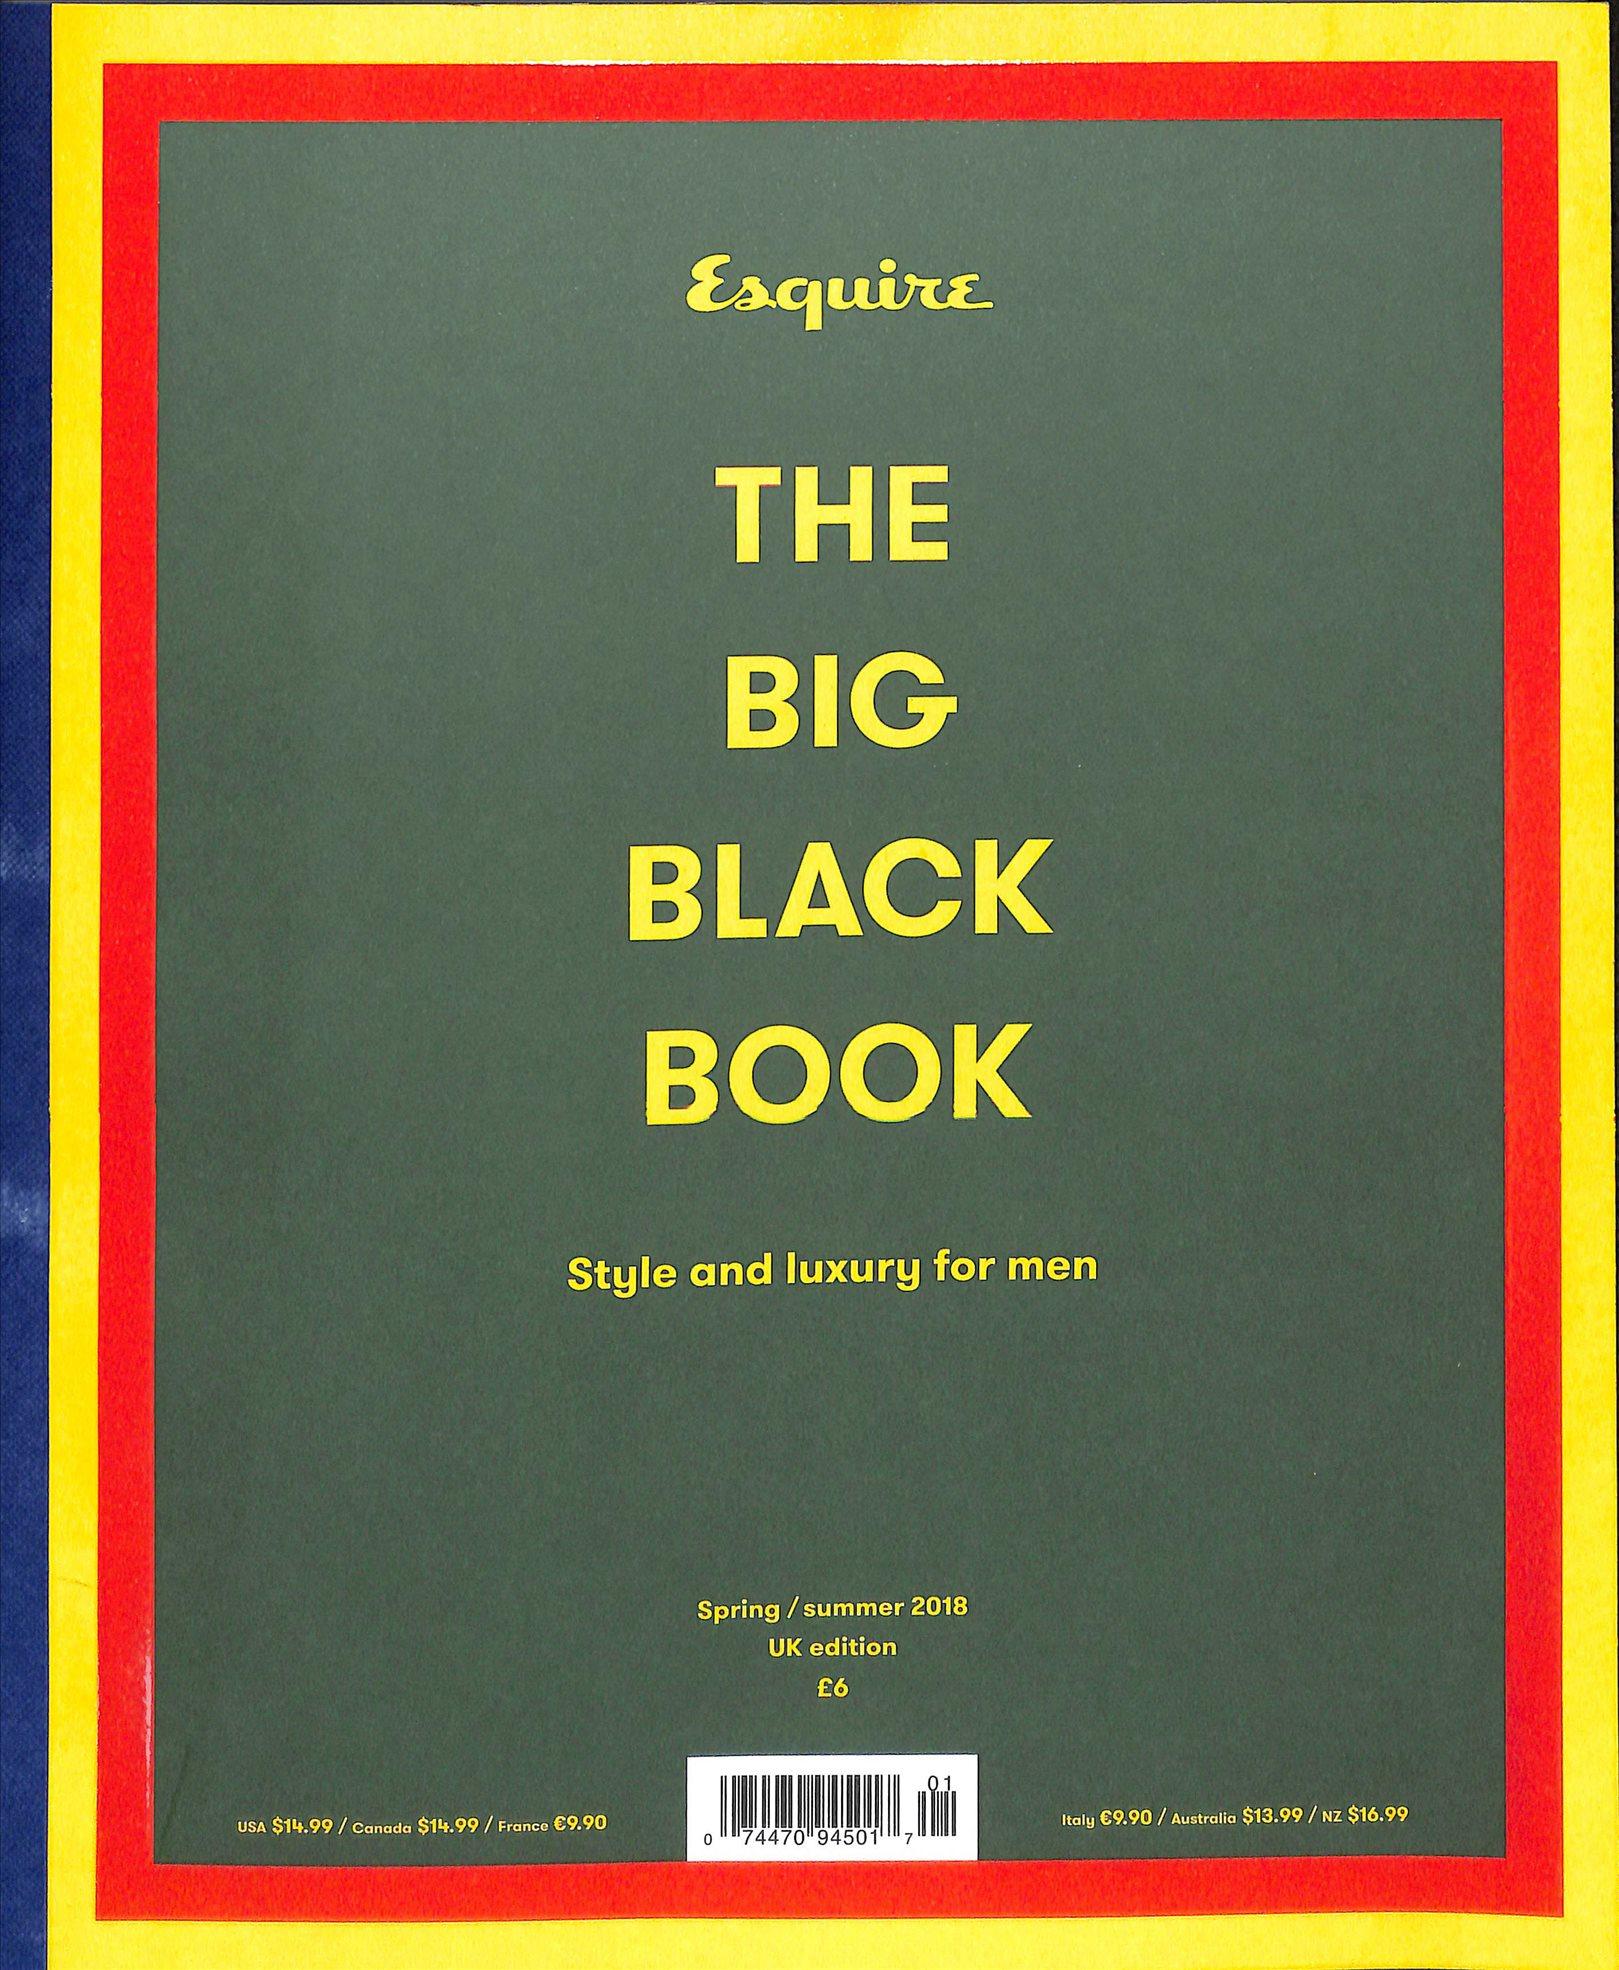 ESQUIRE THE BIG BLACK BOOK